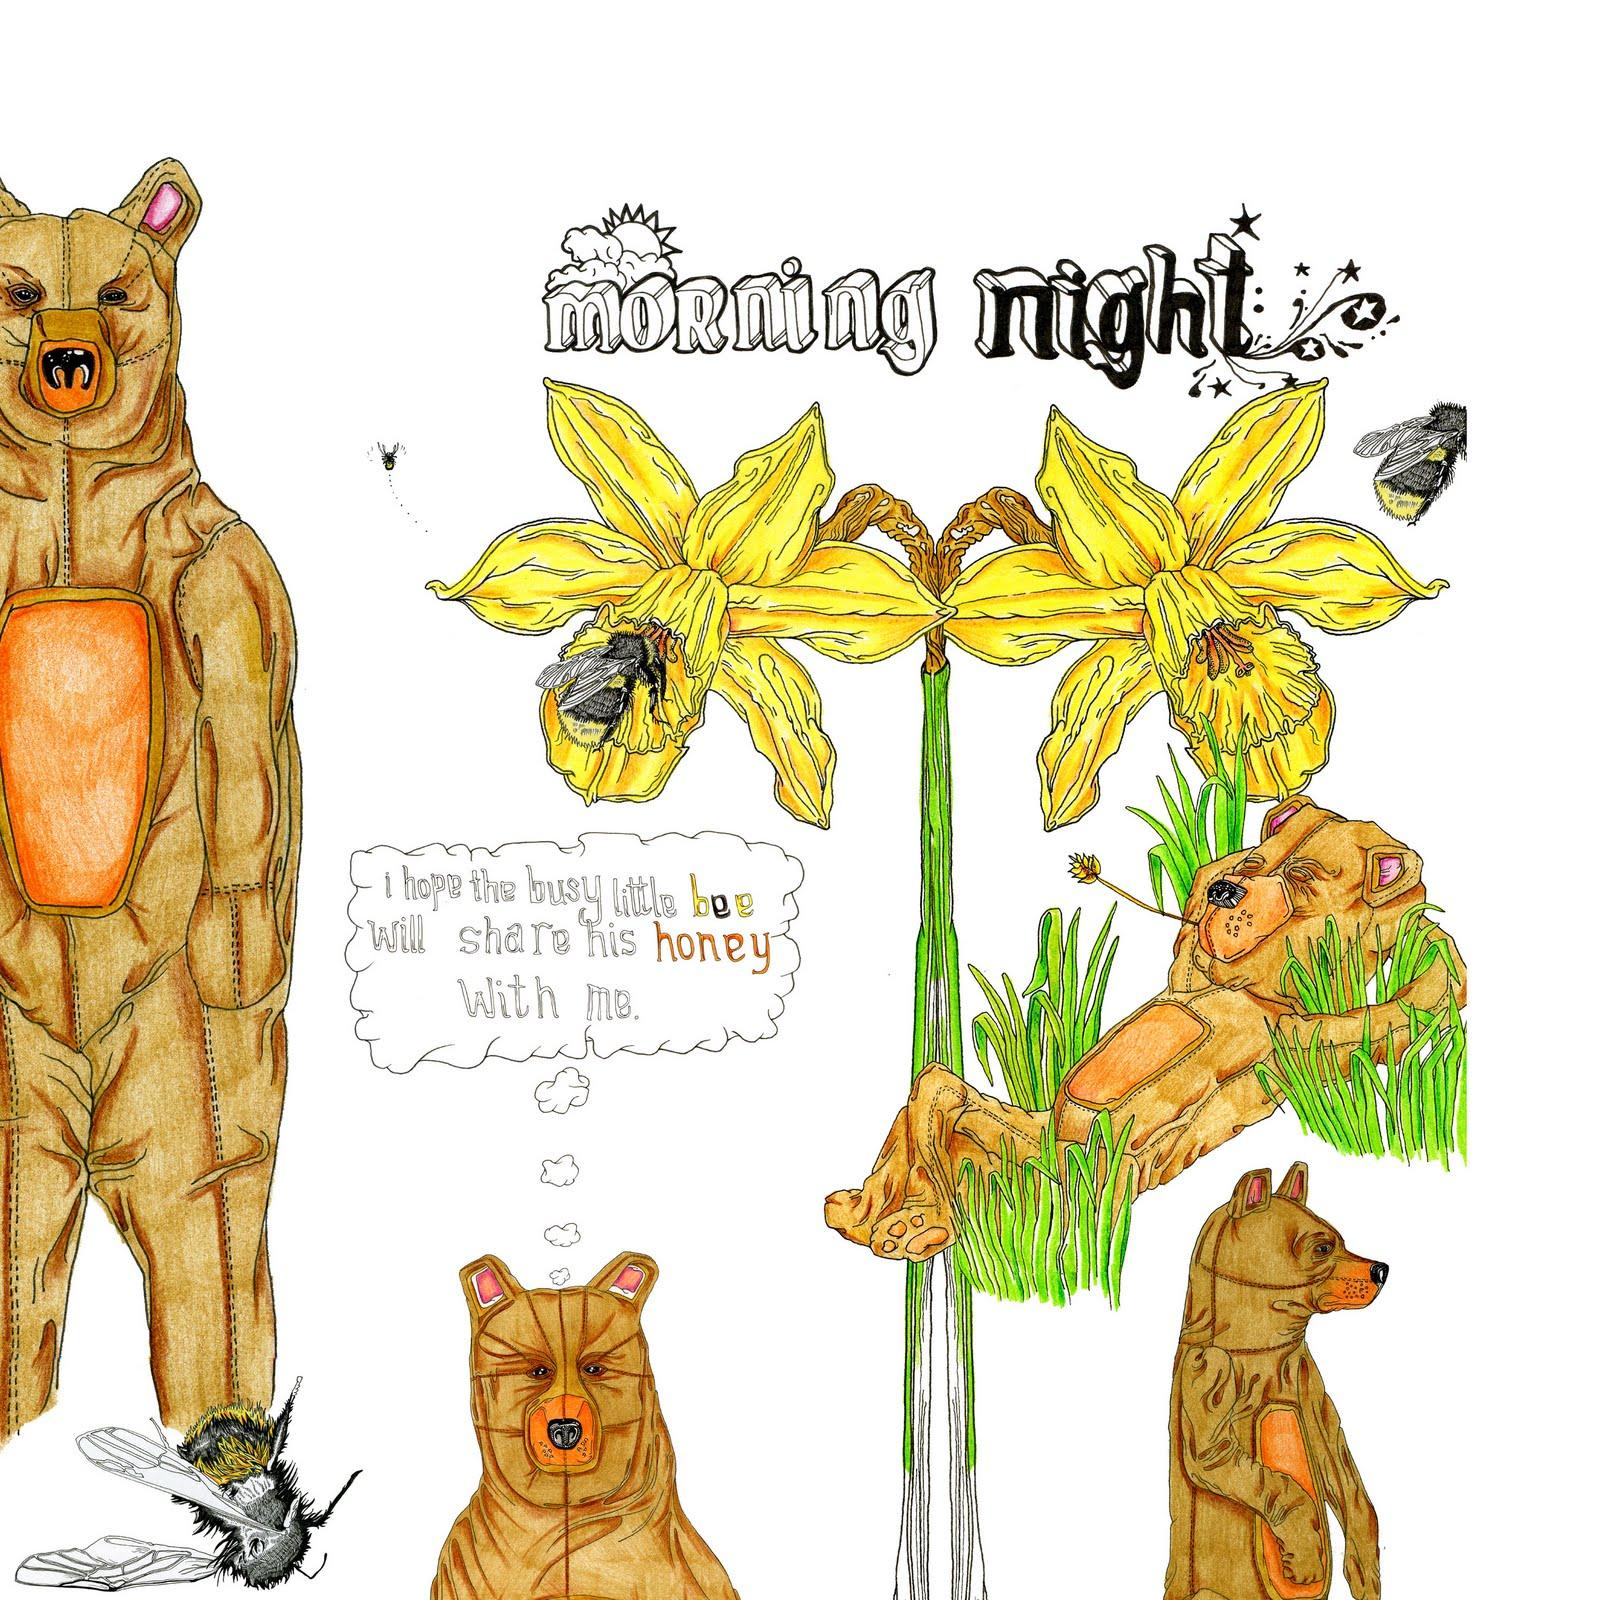 [bear+and+bee]